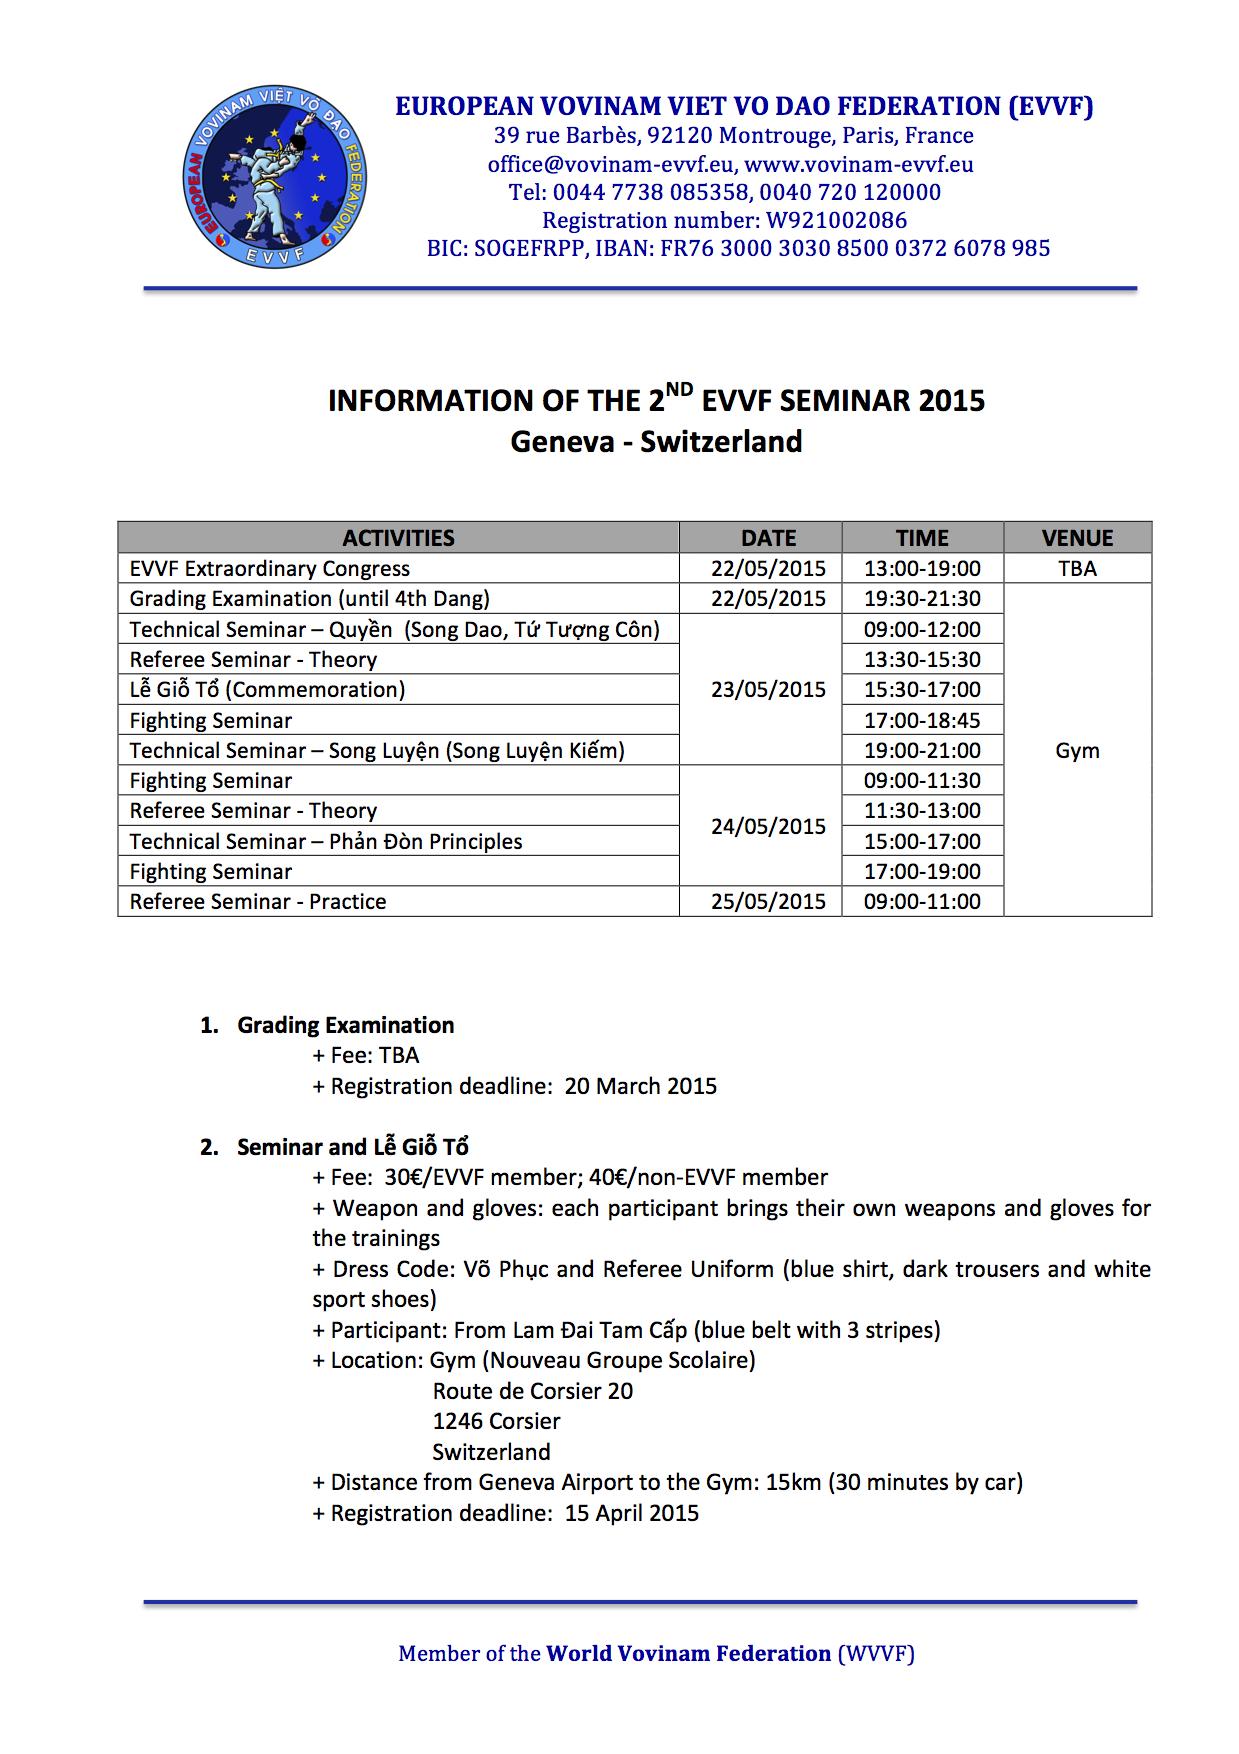 The 2nd EVVF Seminar 2015 - Information